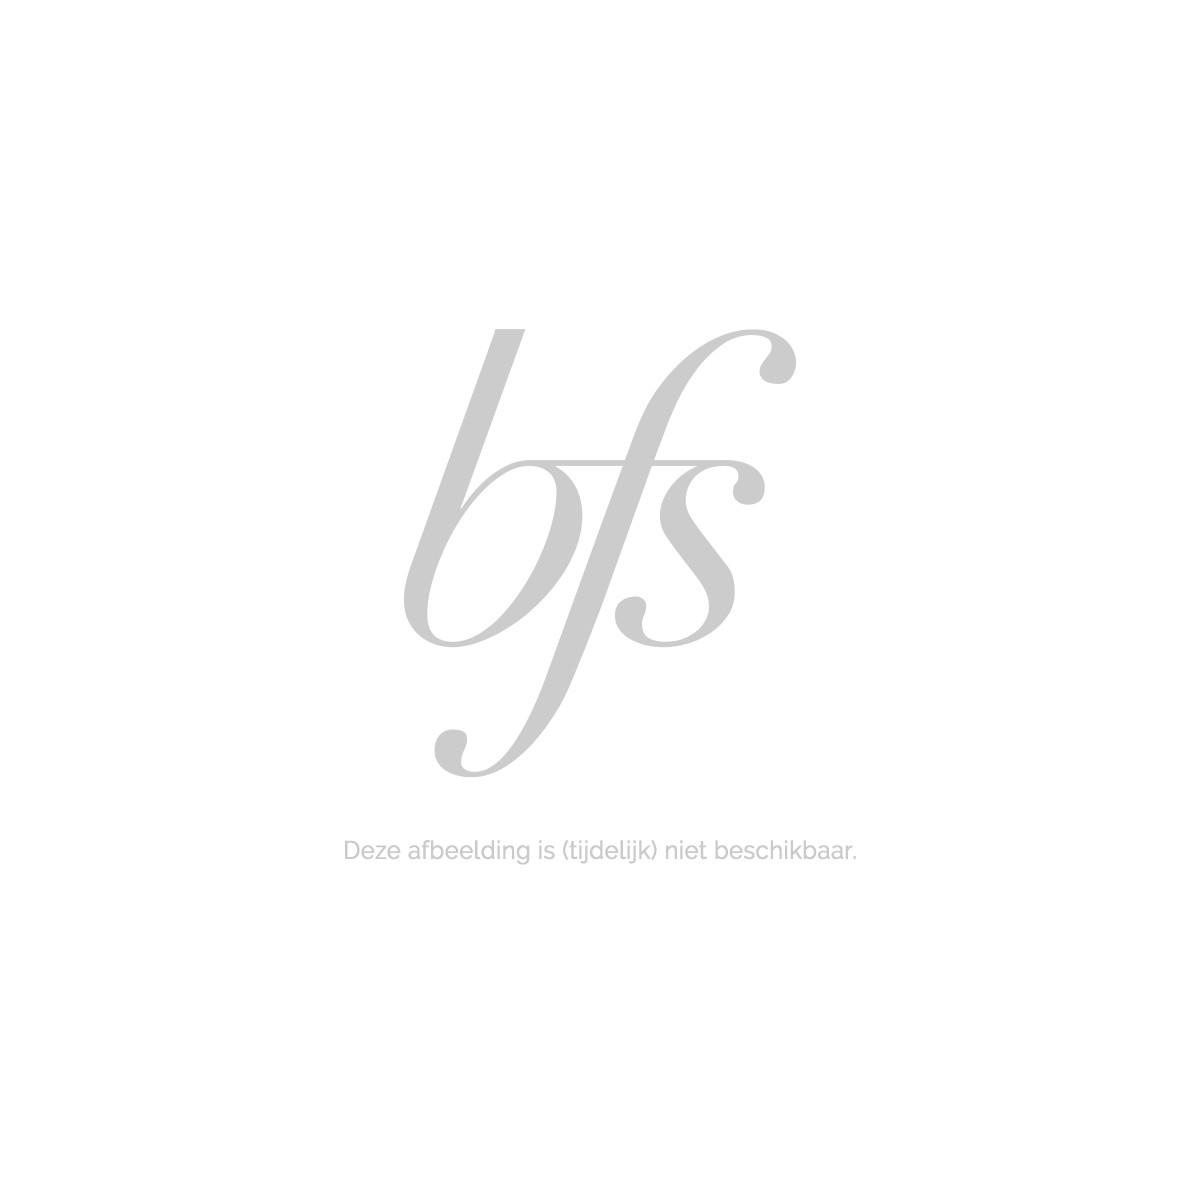 Givenchy Ysatis Eau De Toilette Spray 100 Ml